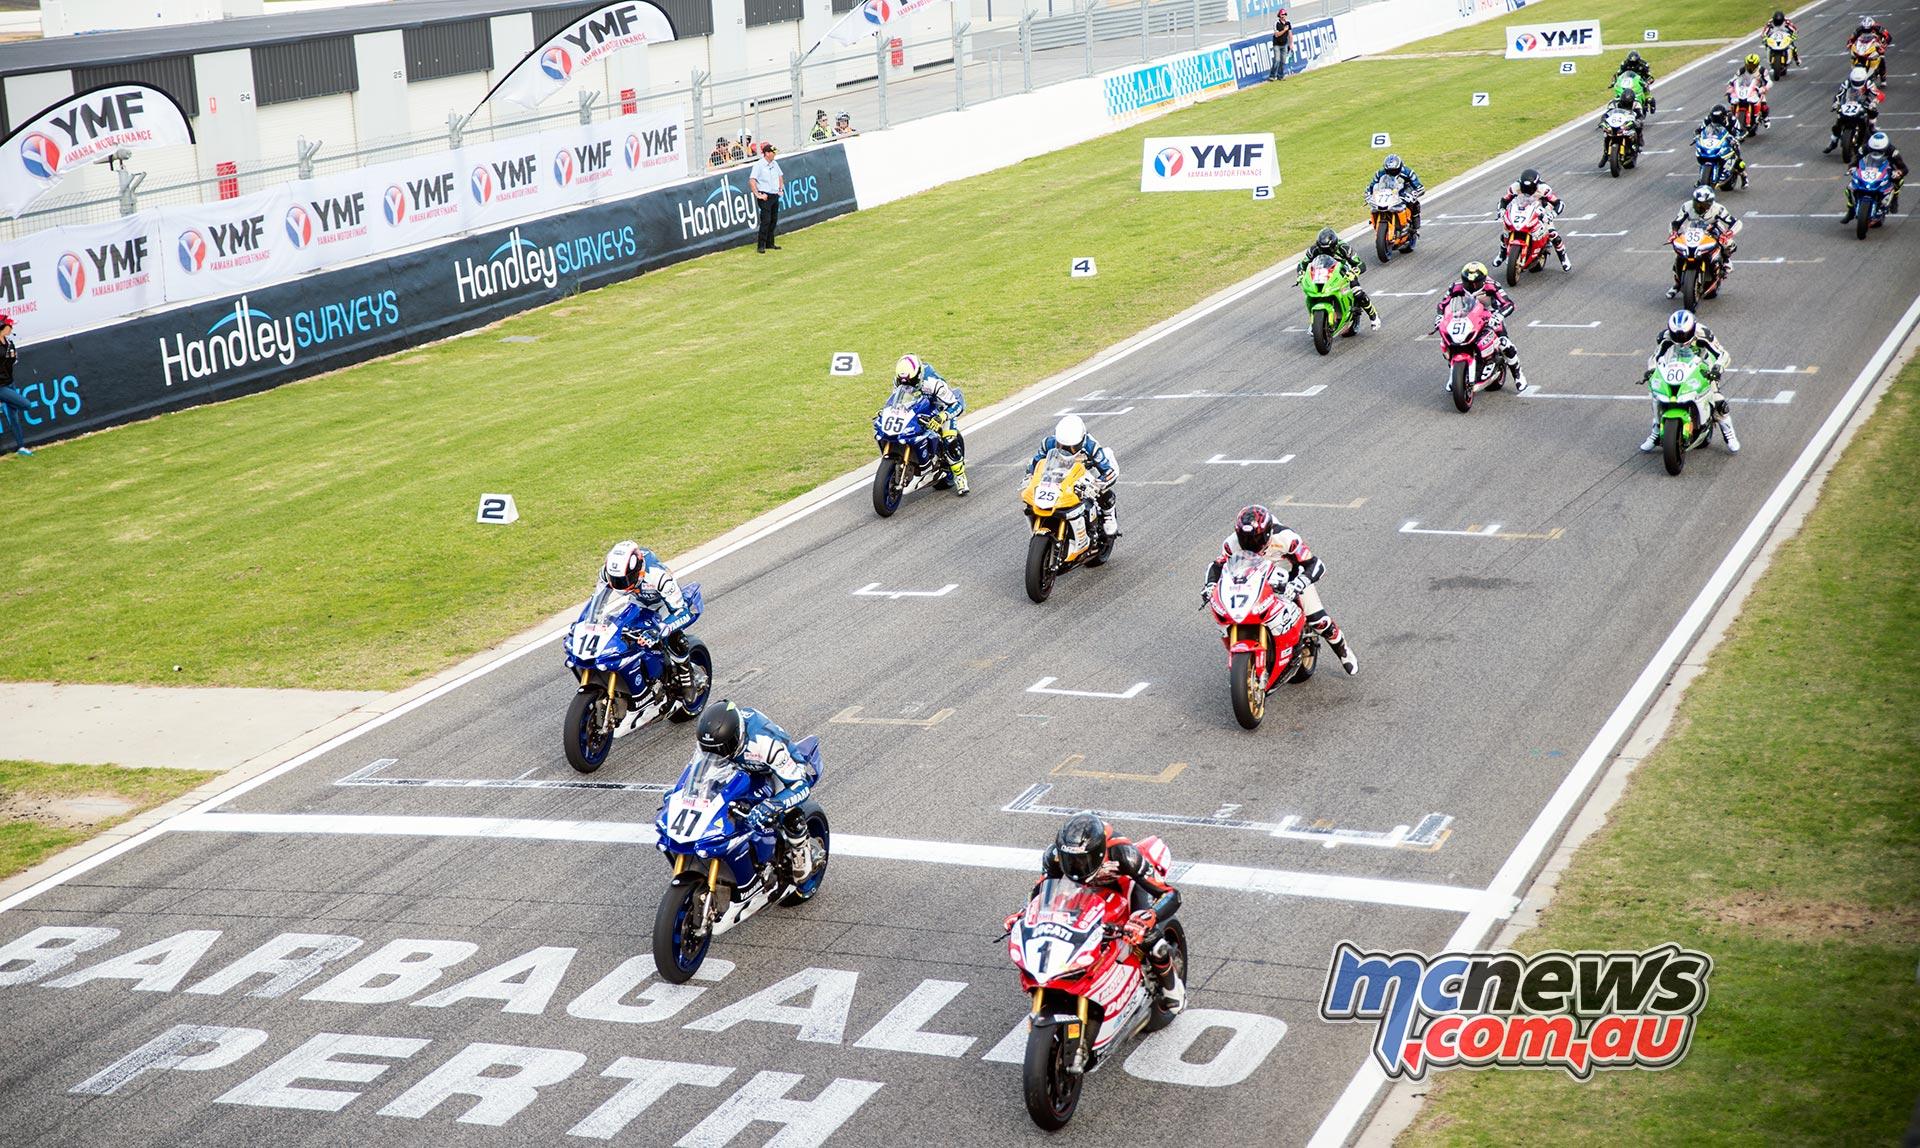 ASBK 2016 - Round Four - Superbike Race Two Start